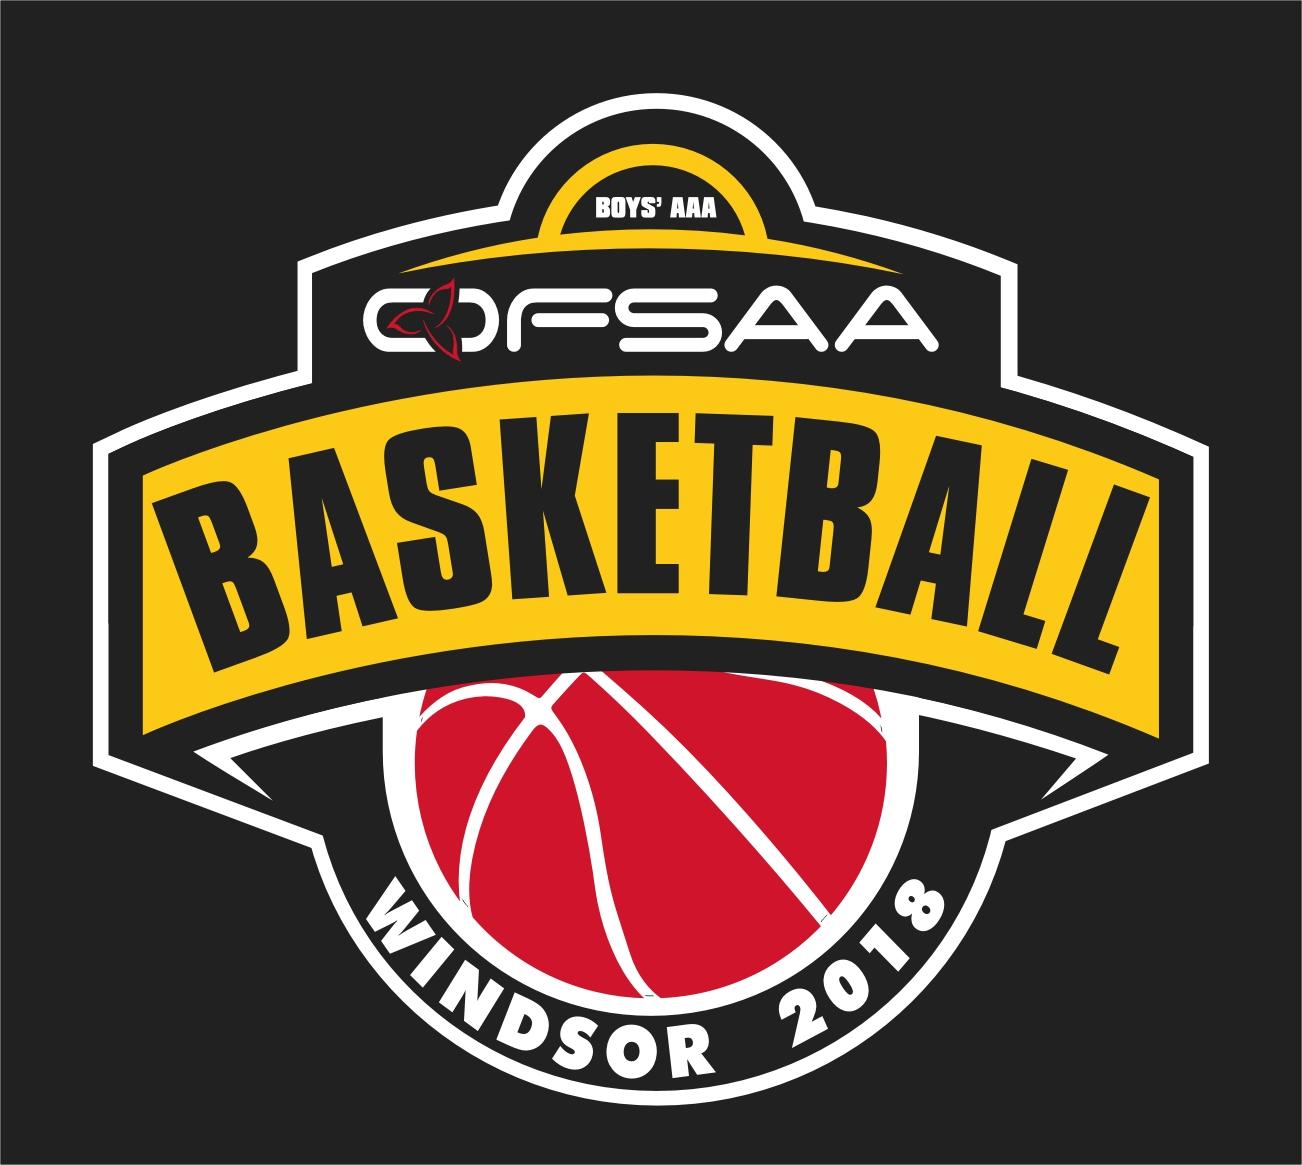 2018 Boys AAA Basketball logo black.jpg